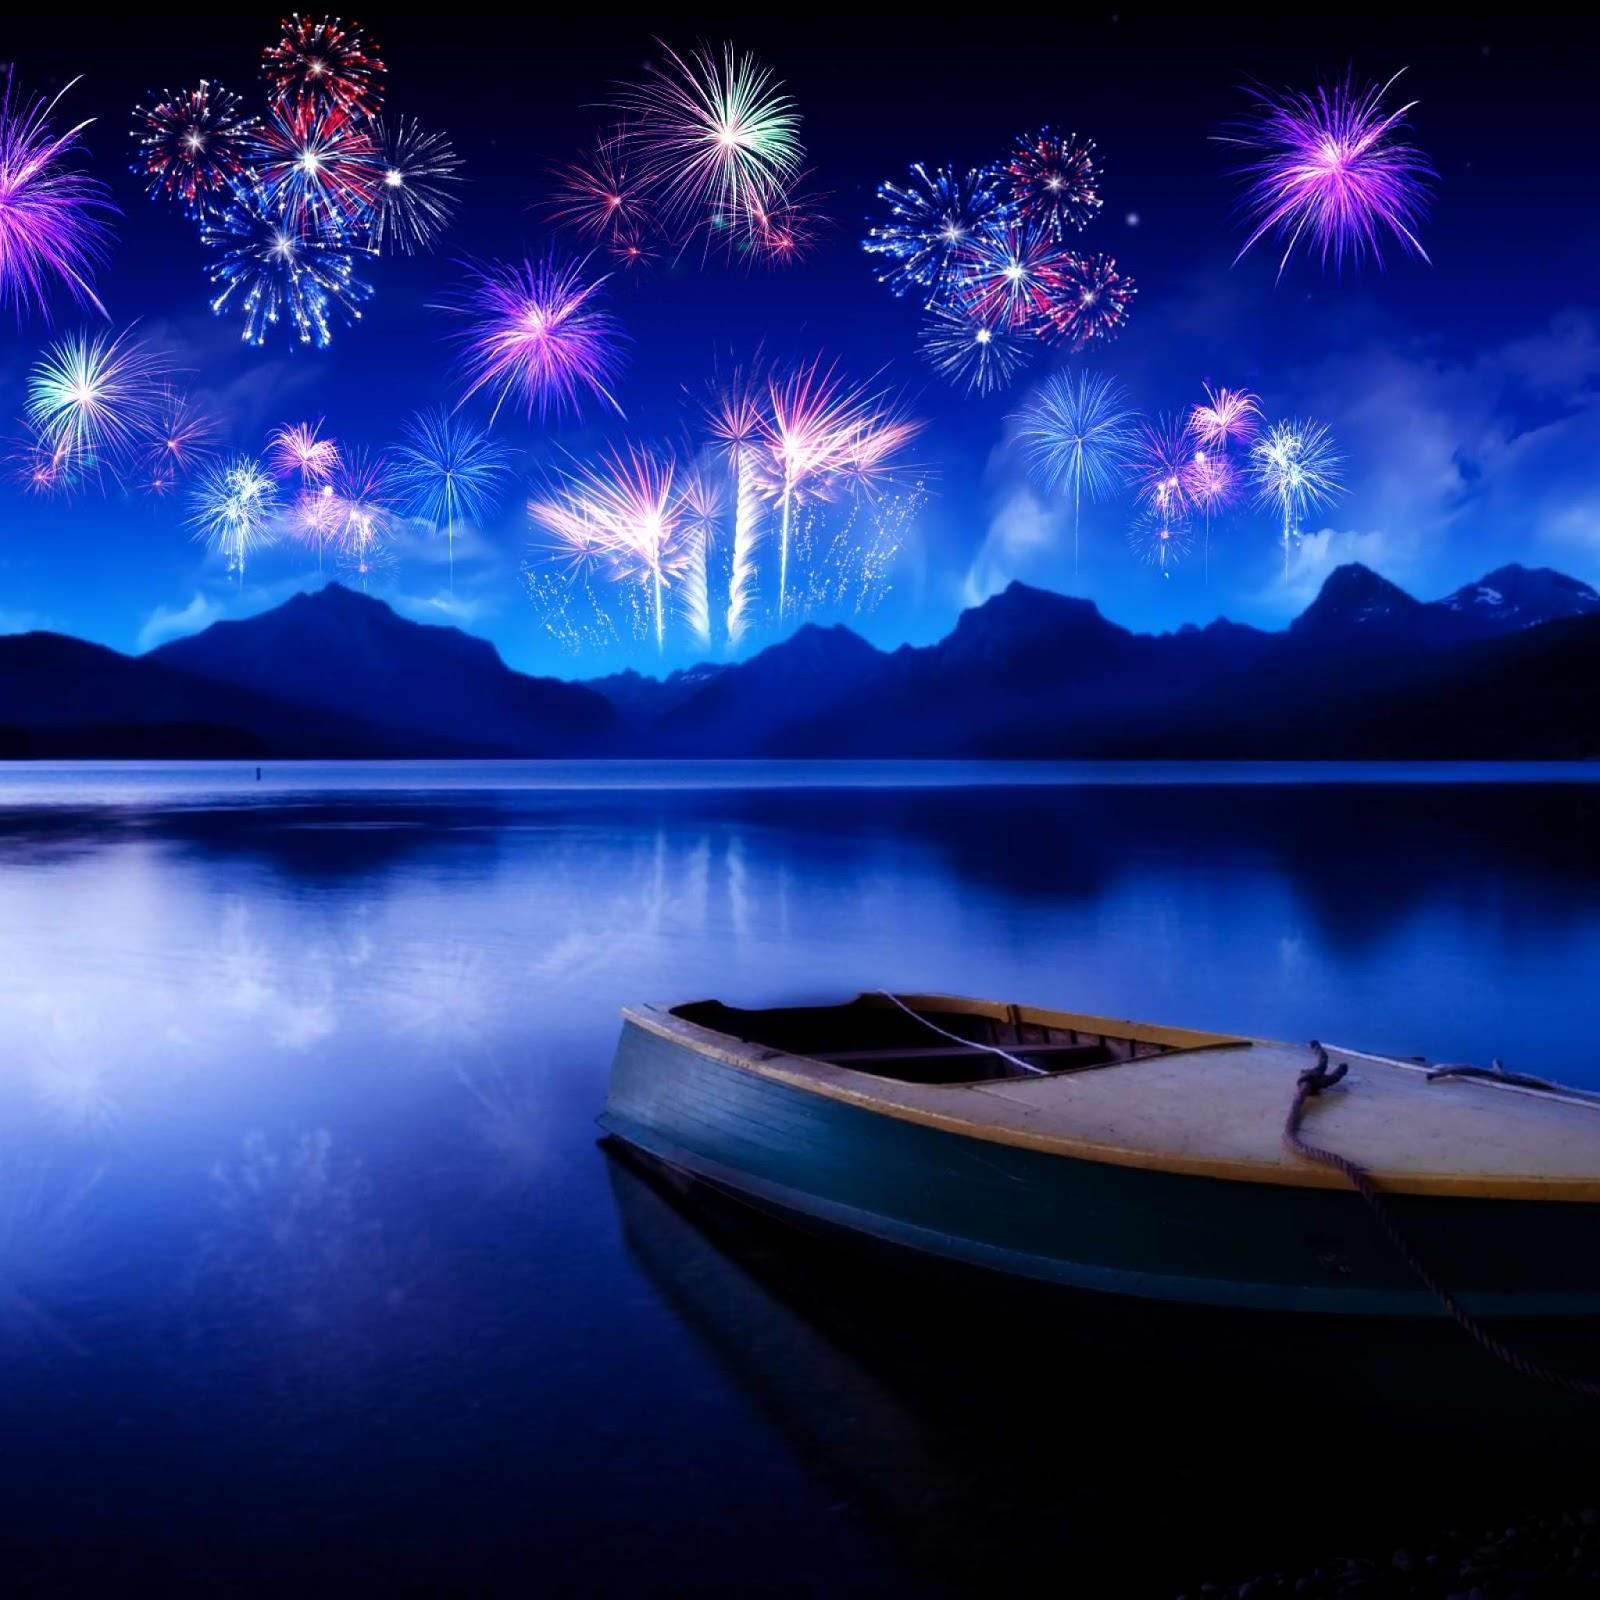 iPad Wallpapers Download New Year 2013 iPad Wallpapers 2048x2048 1600x1600